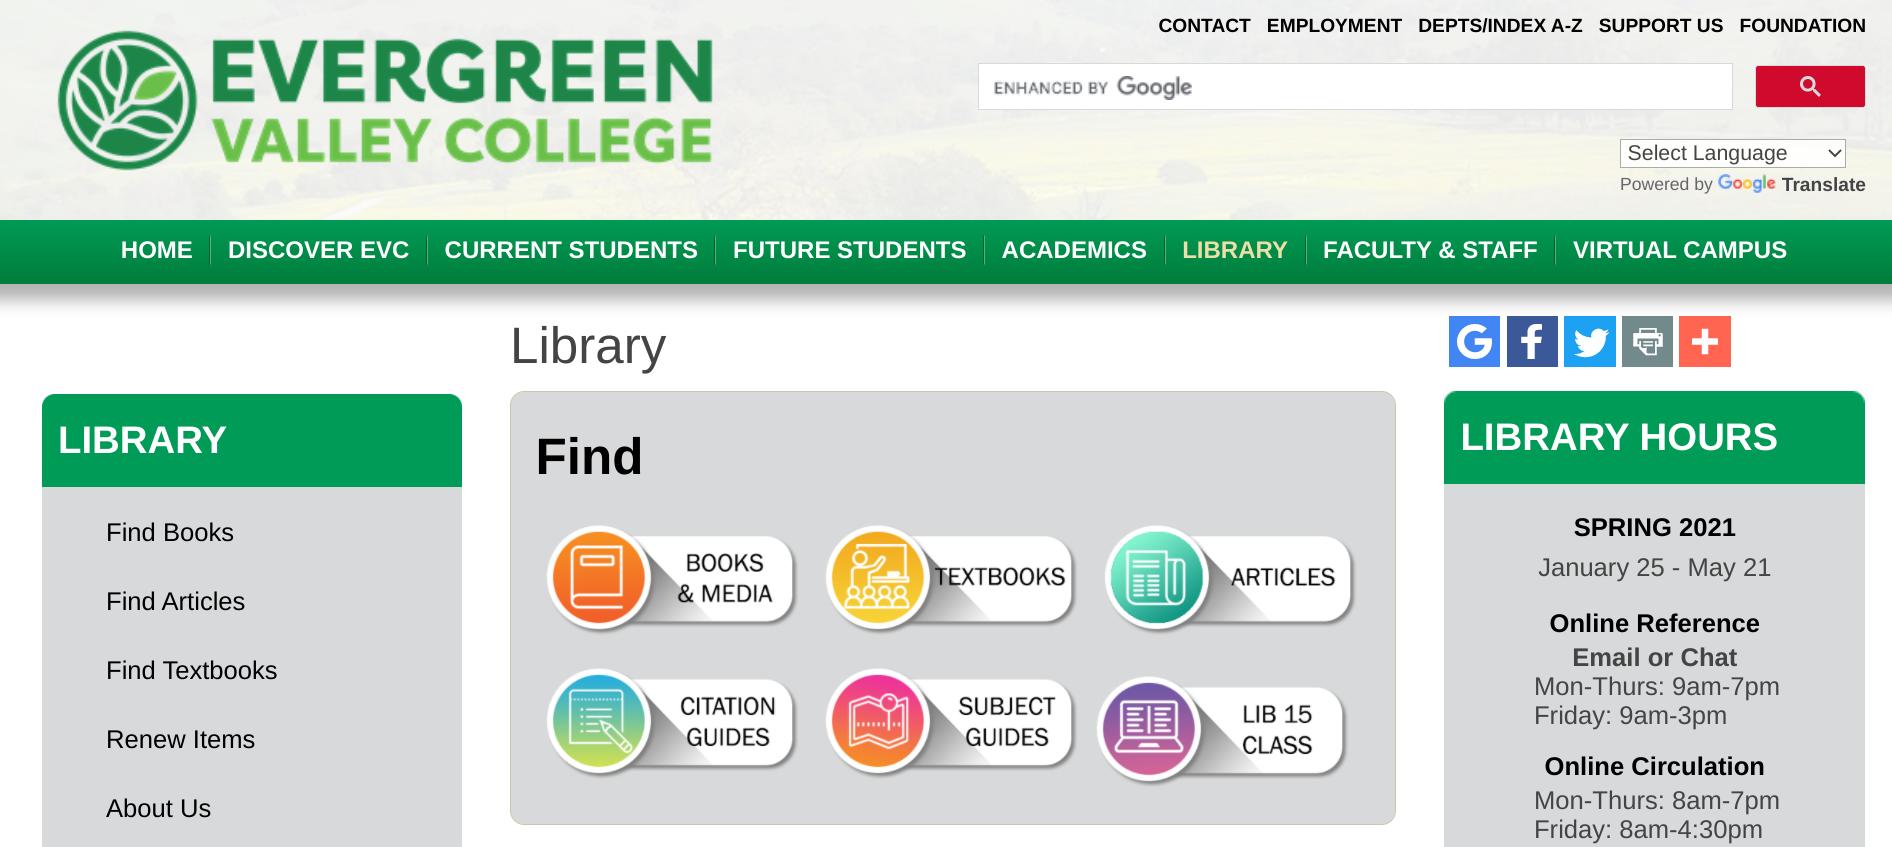 Evergreen Valley College Website